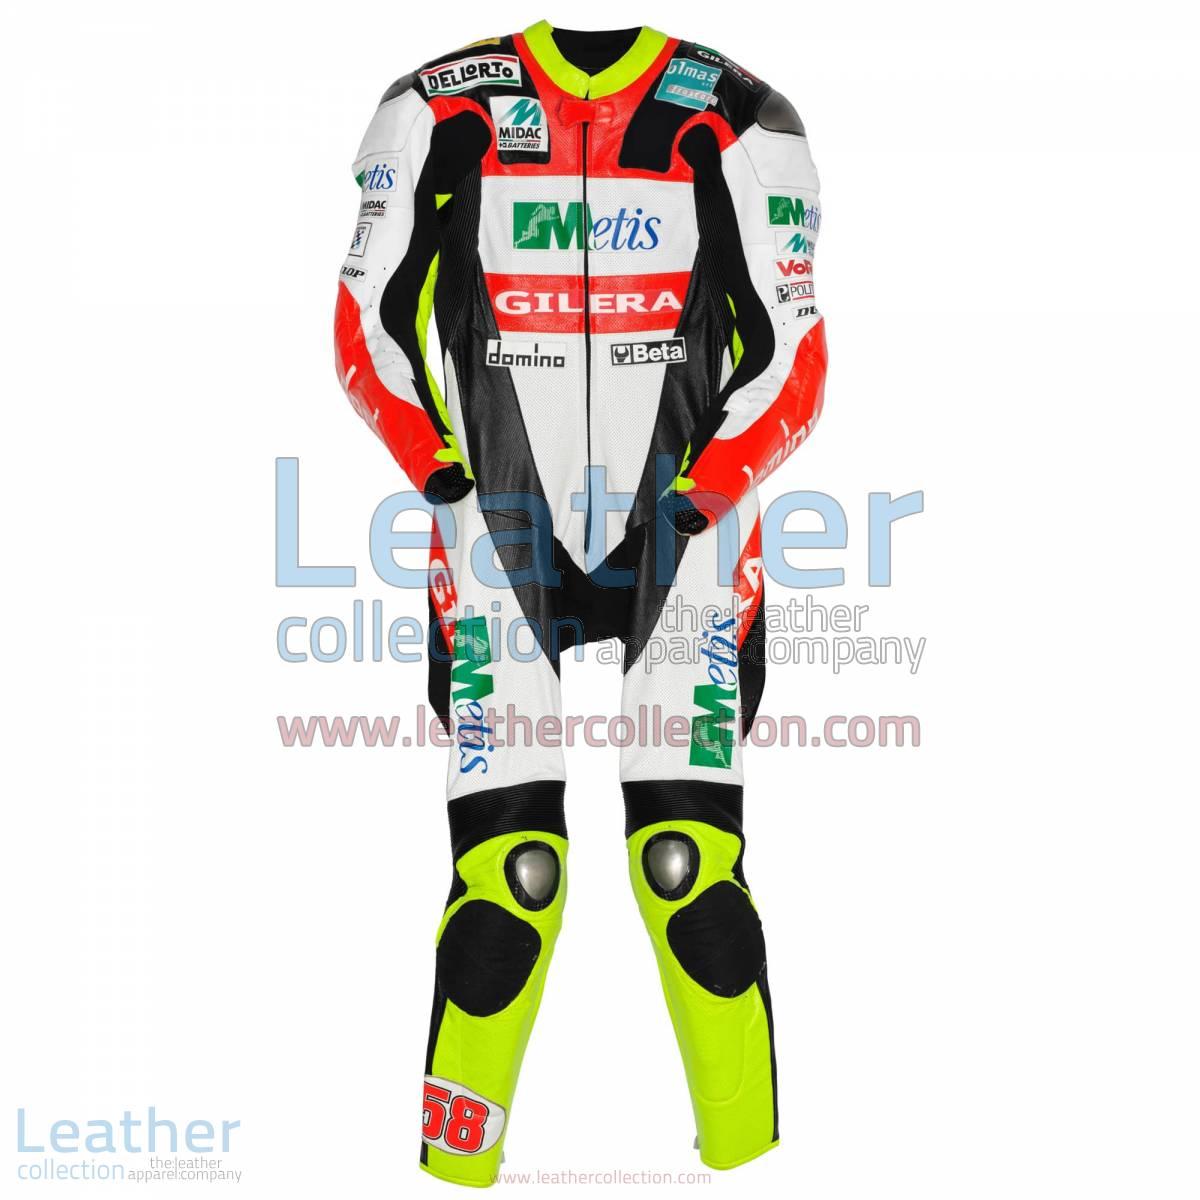 Marco Simoncelli Gilera GP 2008 Leathers | marco simoncelli leathers